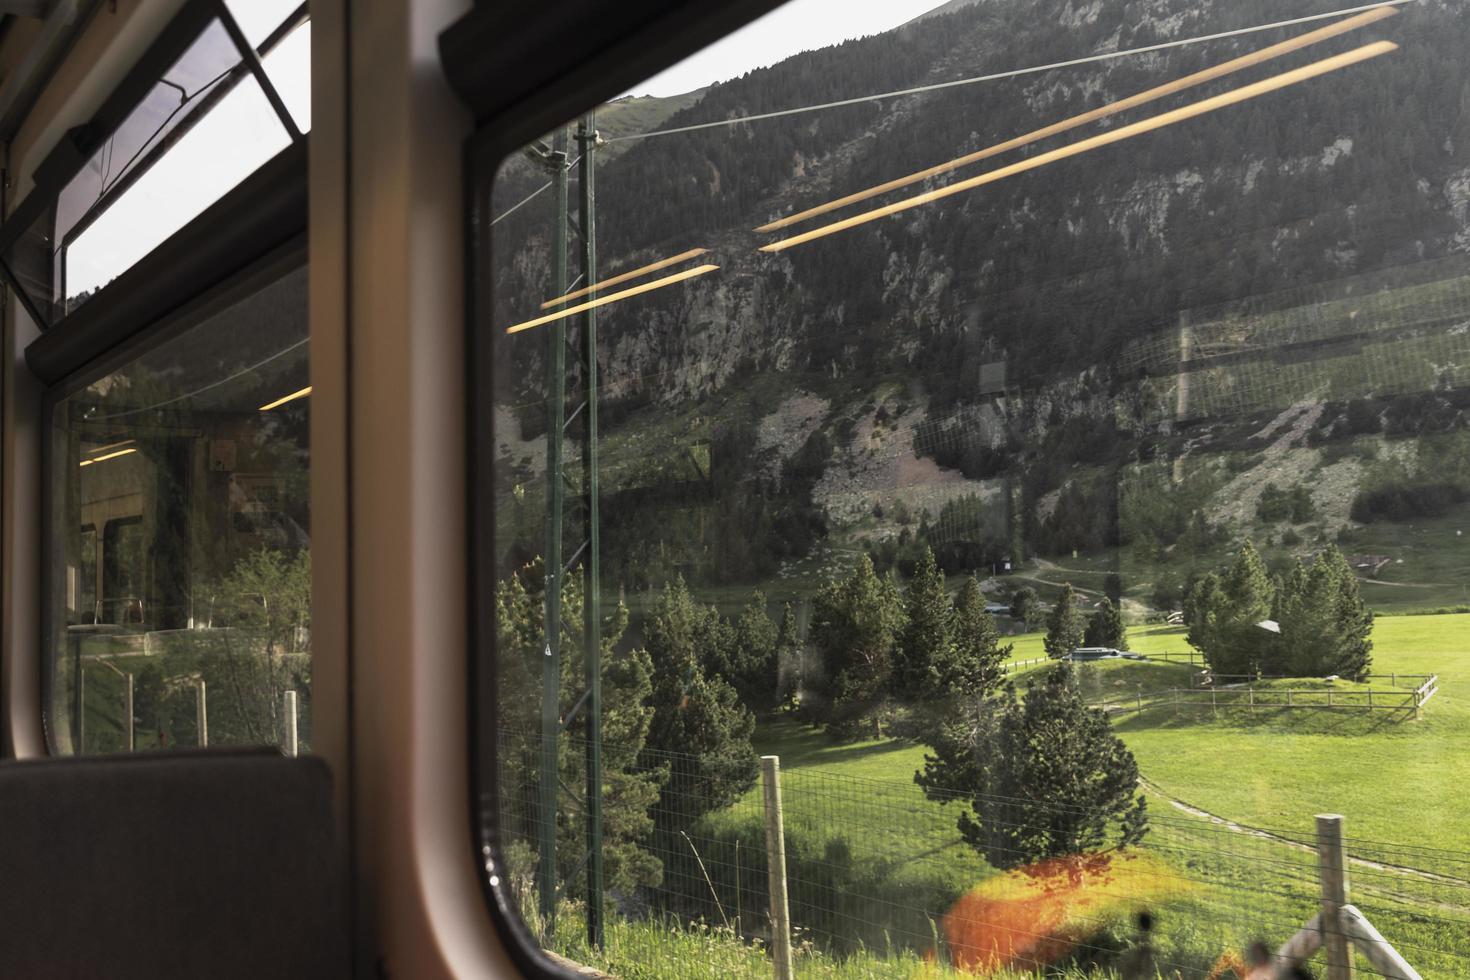 le concept de voyage en train photo